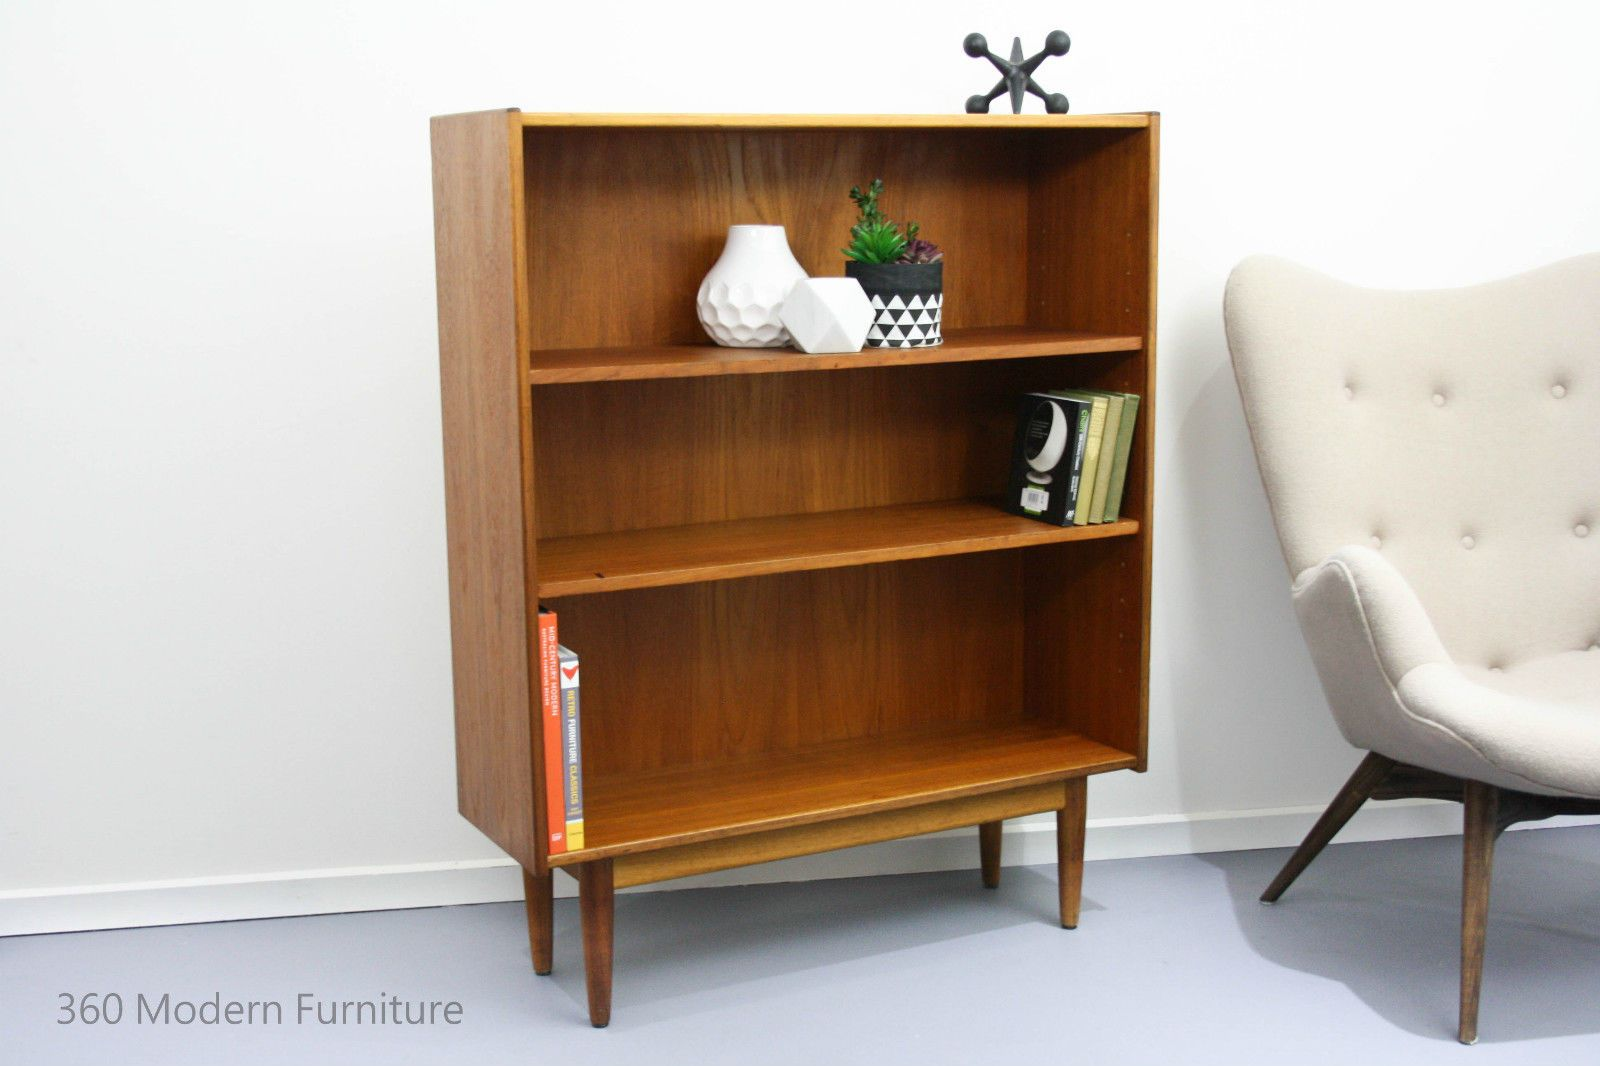 Mid Century Parker Bookcase Shelves Teak Sideboard Display Vintage Retro Slim In Home Garden